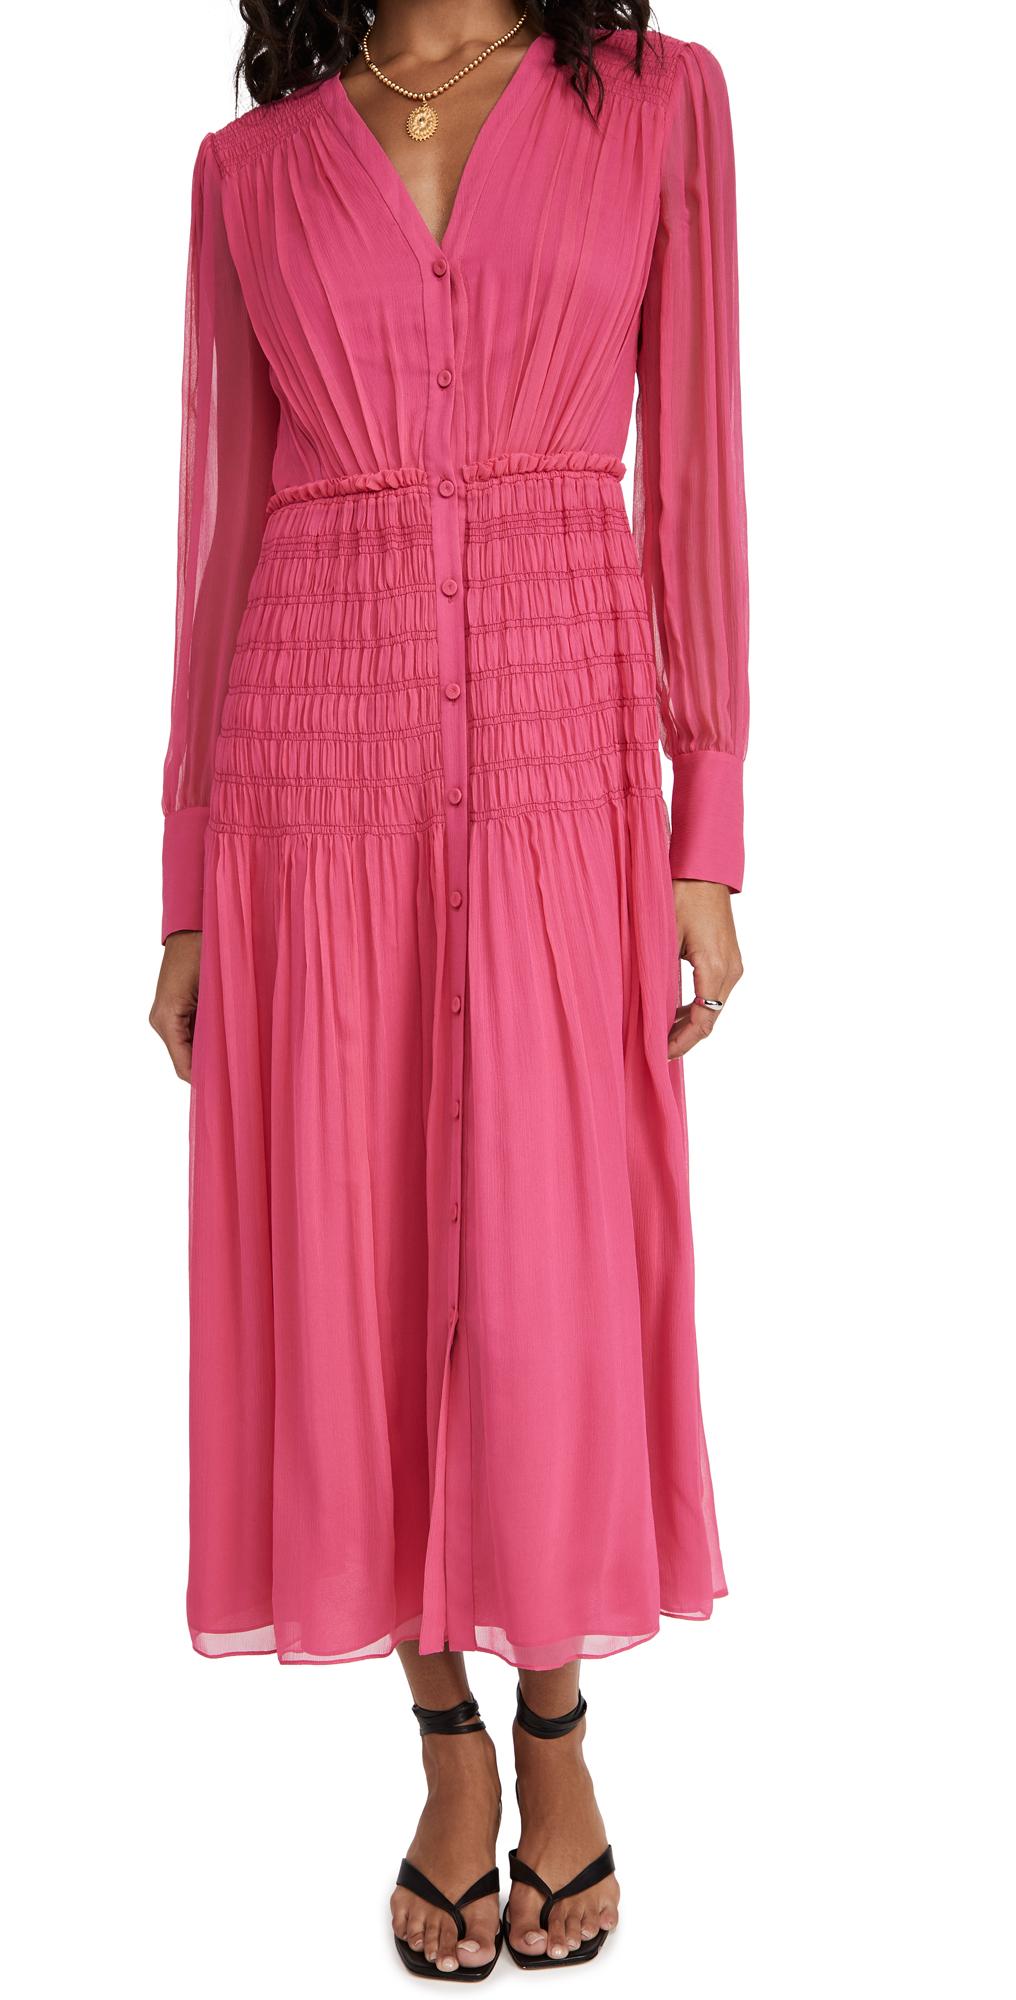 Jason Wu Long Sleeve V Neck Chiffon Dress